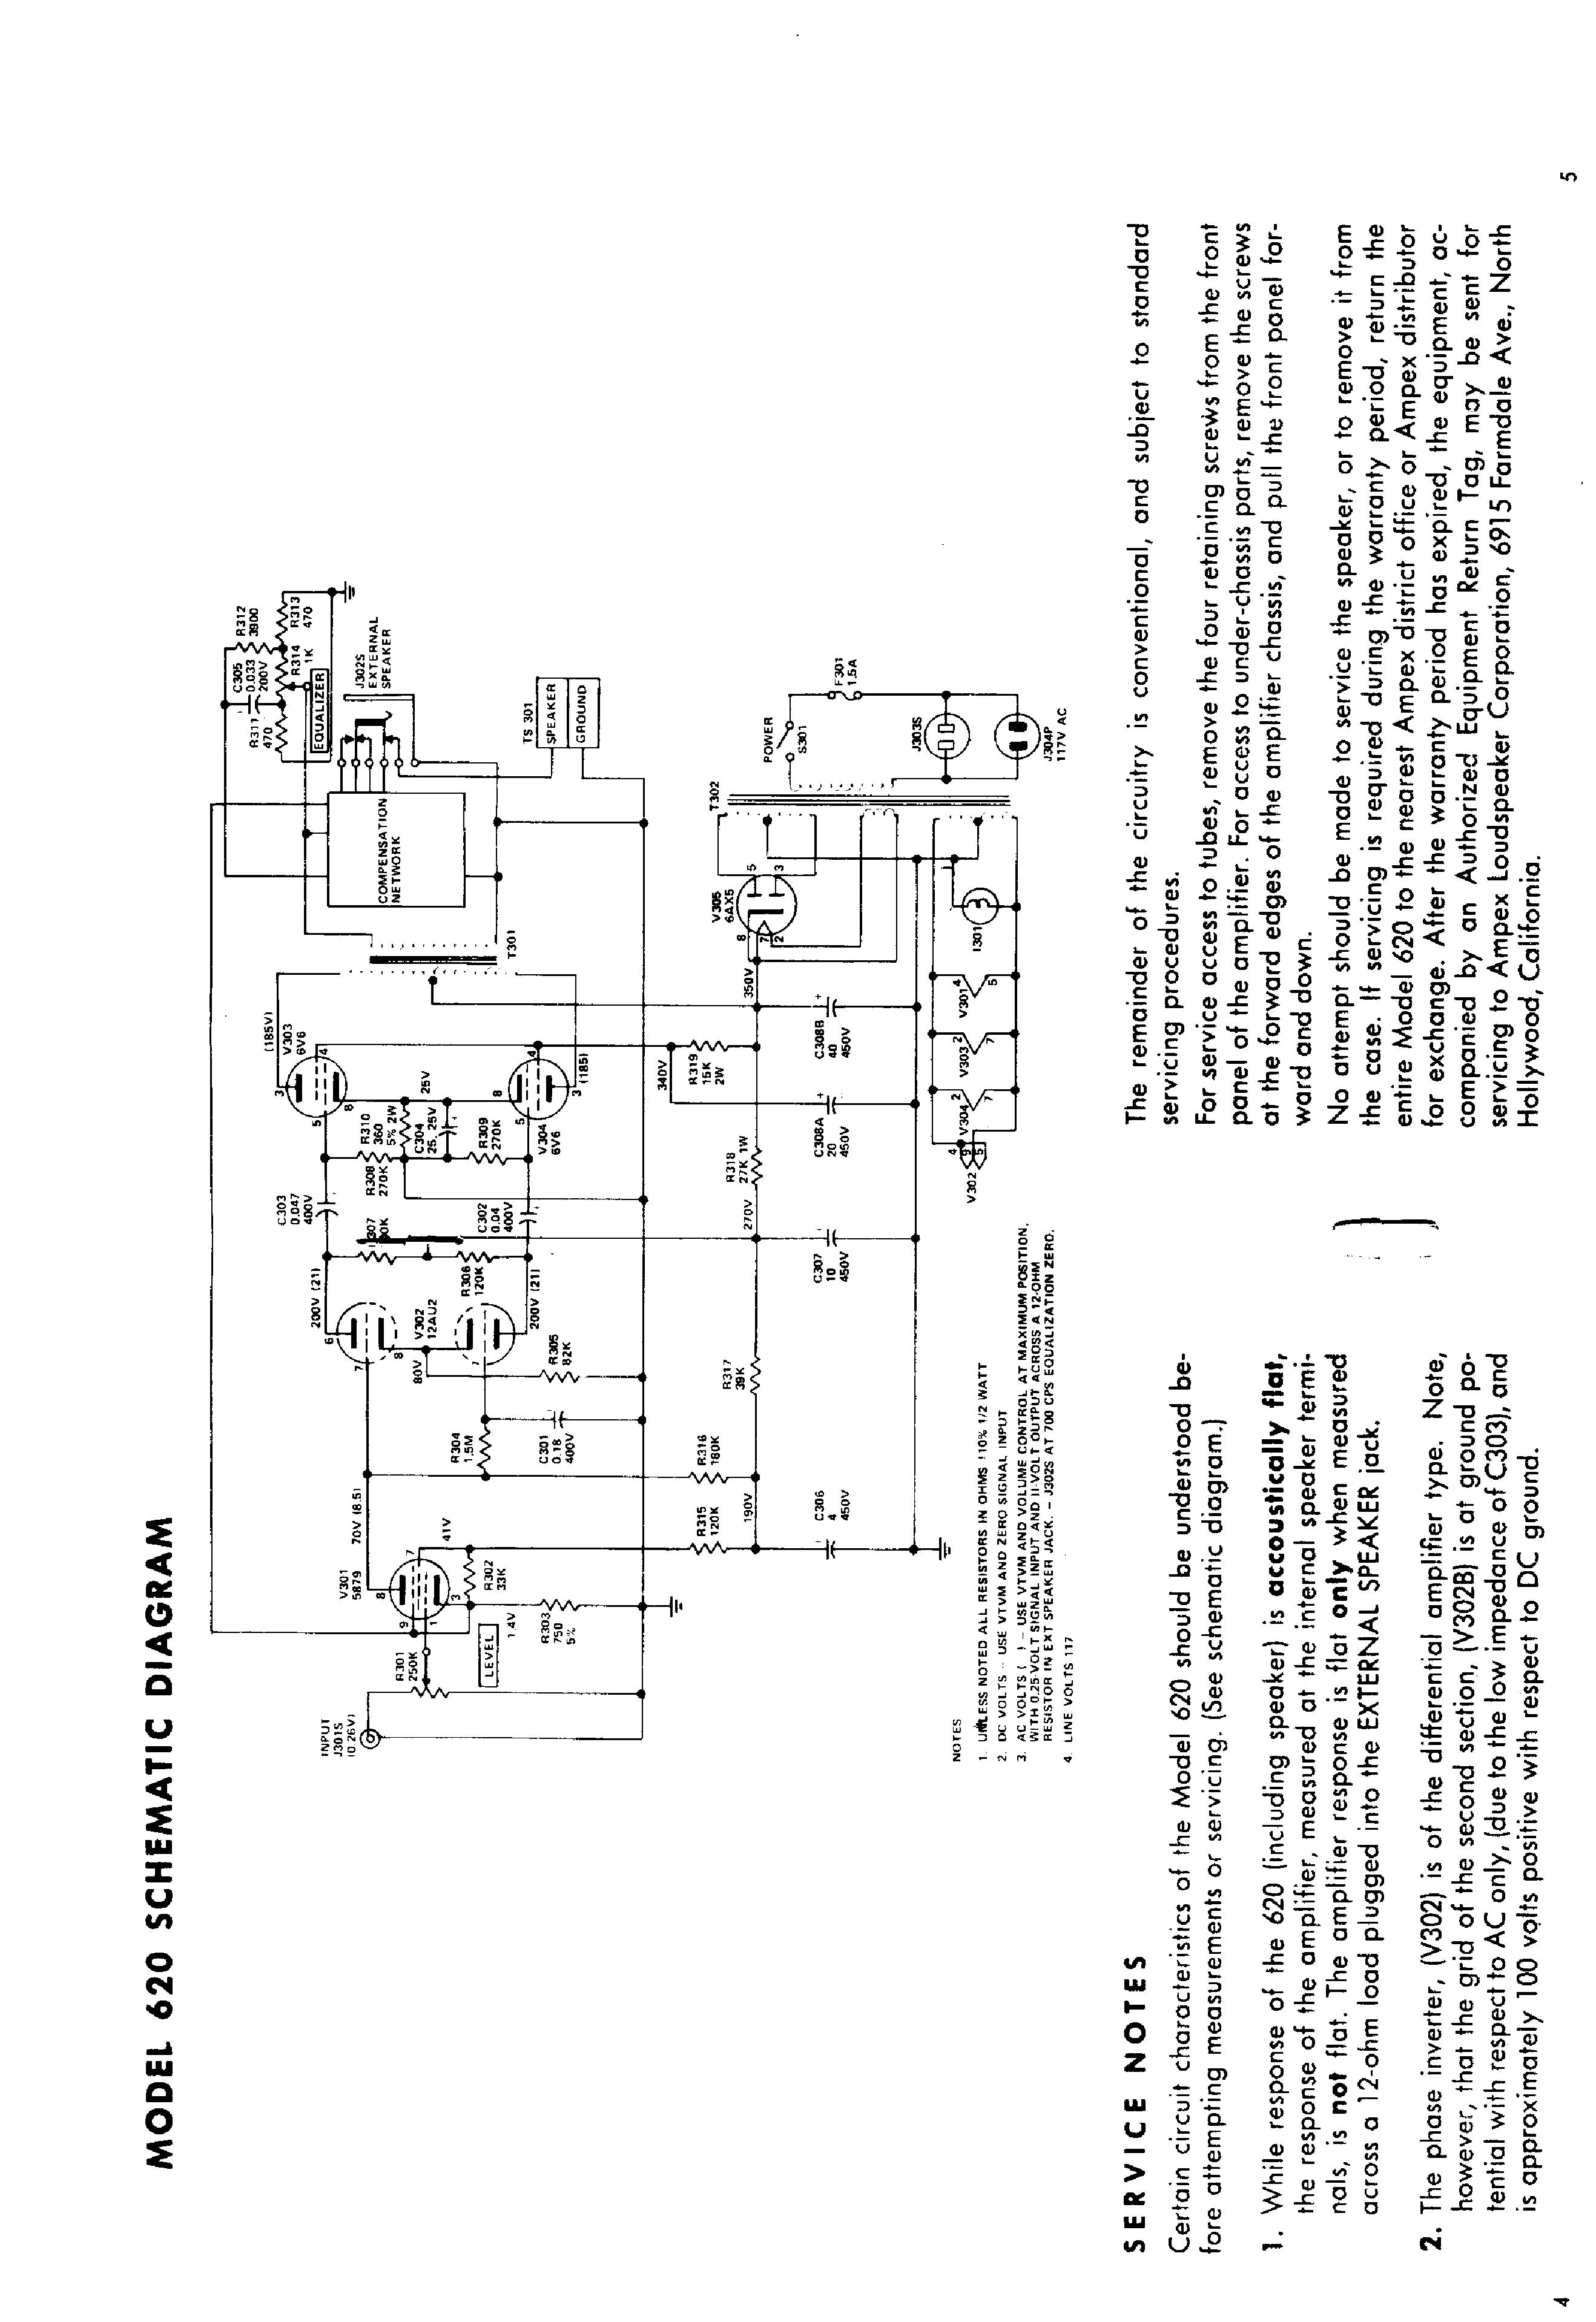 ampex 620 service manual download  schematics  eeprom